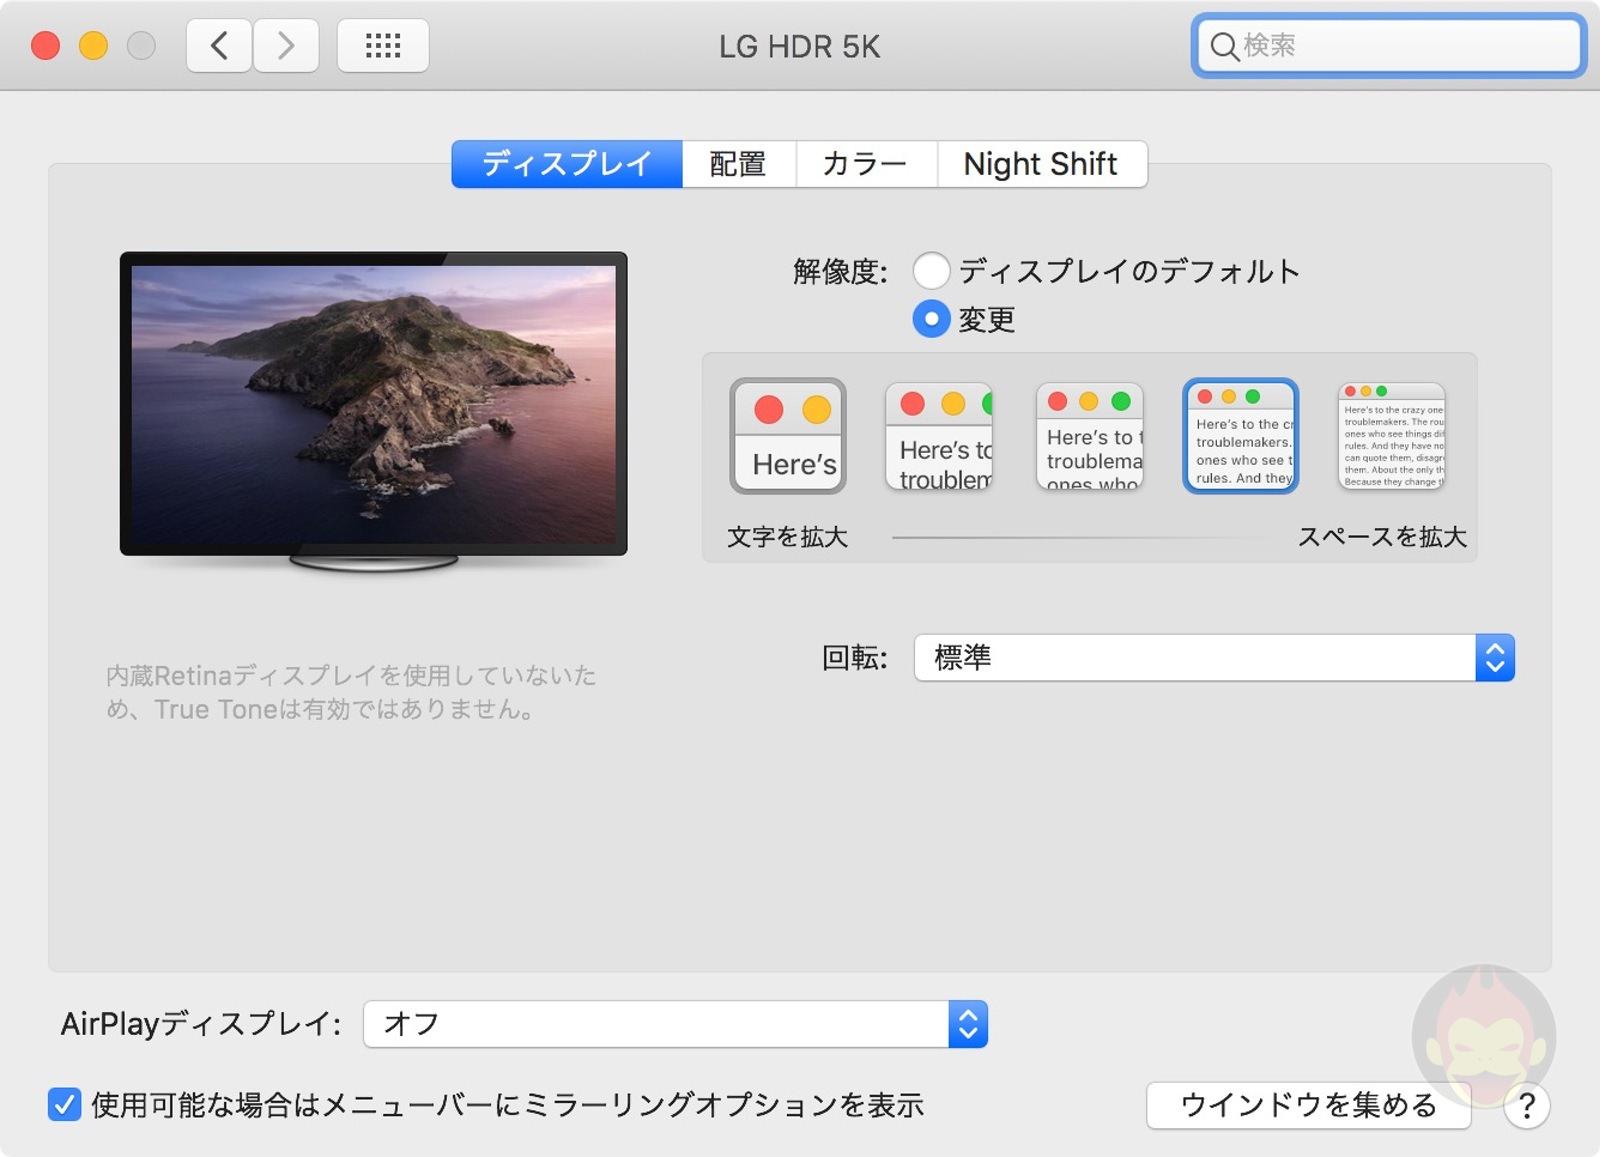 MacBook Pro Error DispalyProblem 02